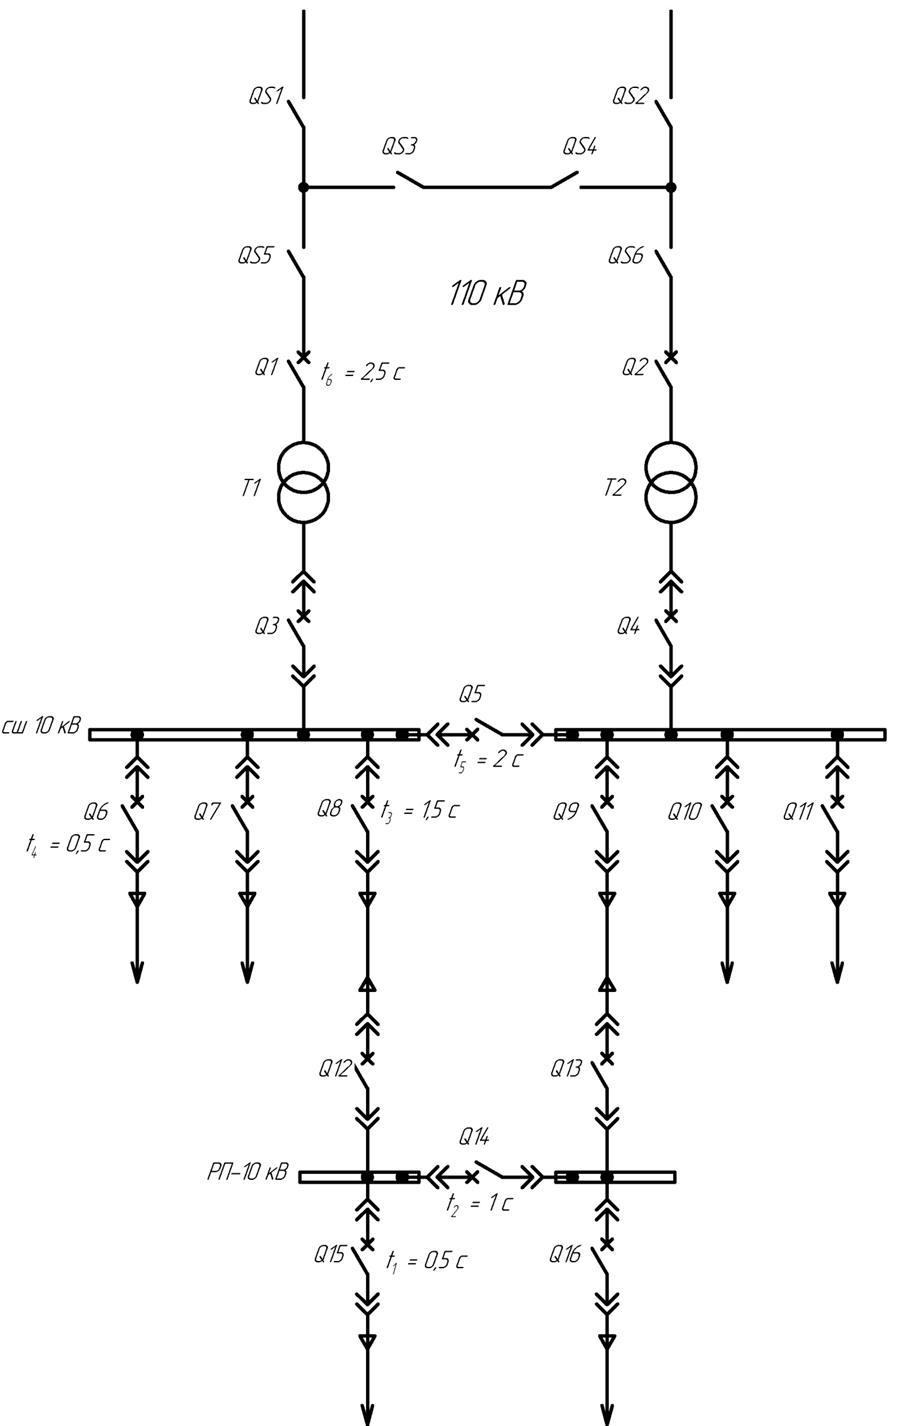 KOMPAS -- Схема сети для карты селективности.jpg